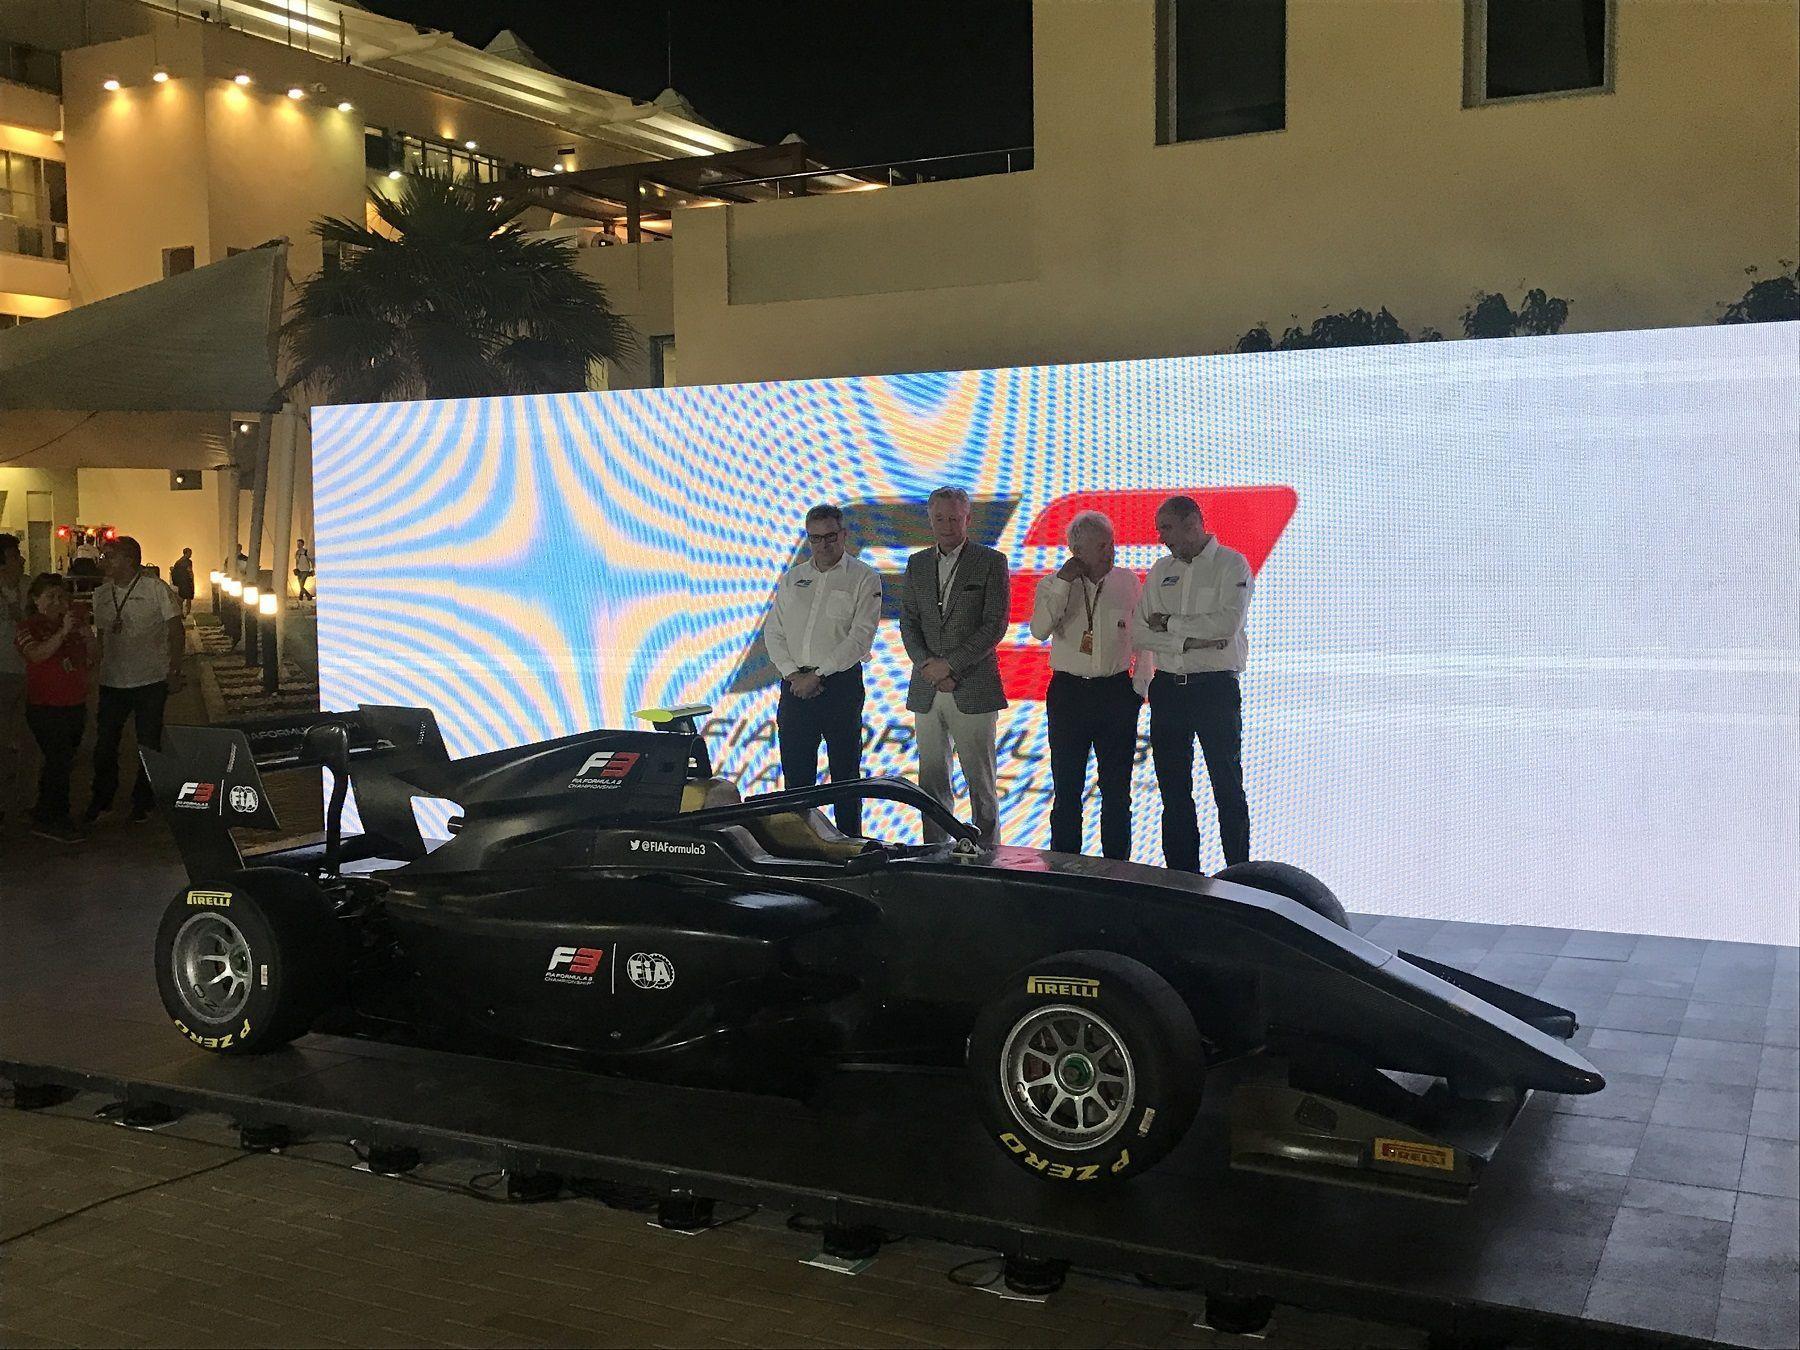 2019 F3 car